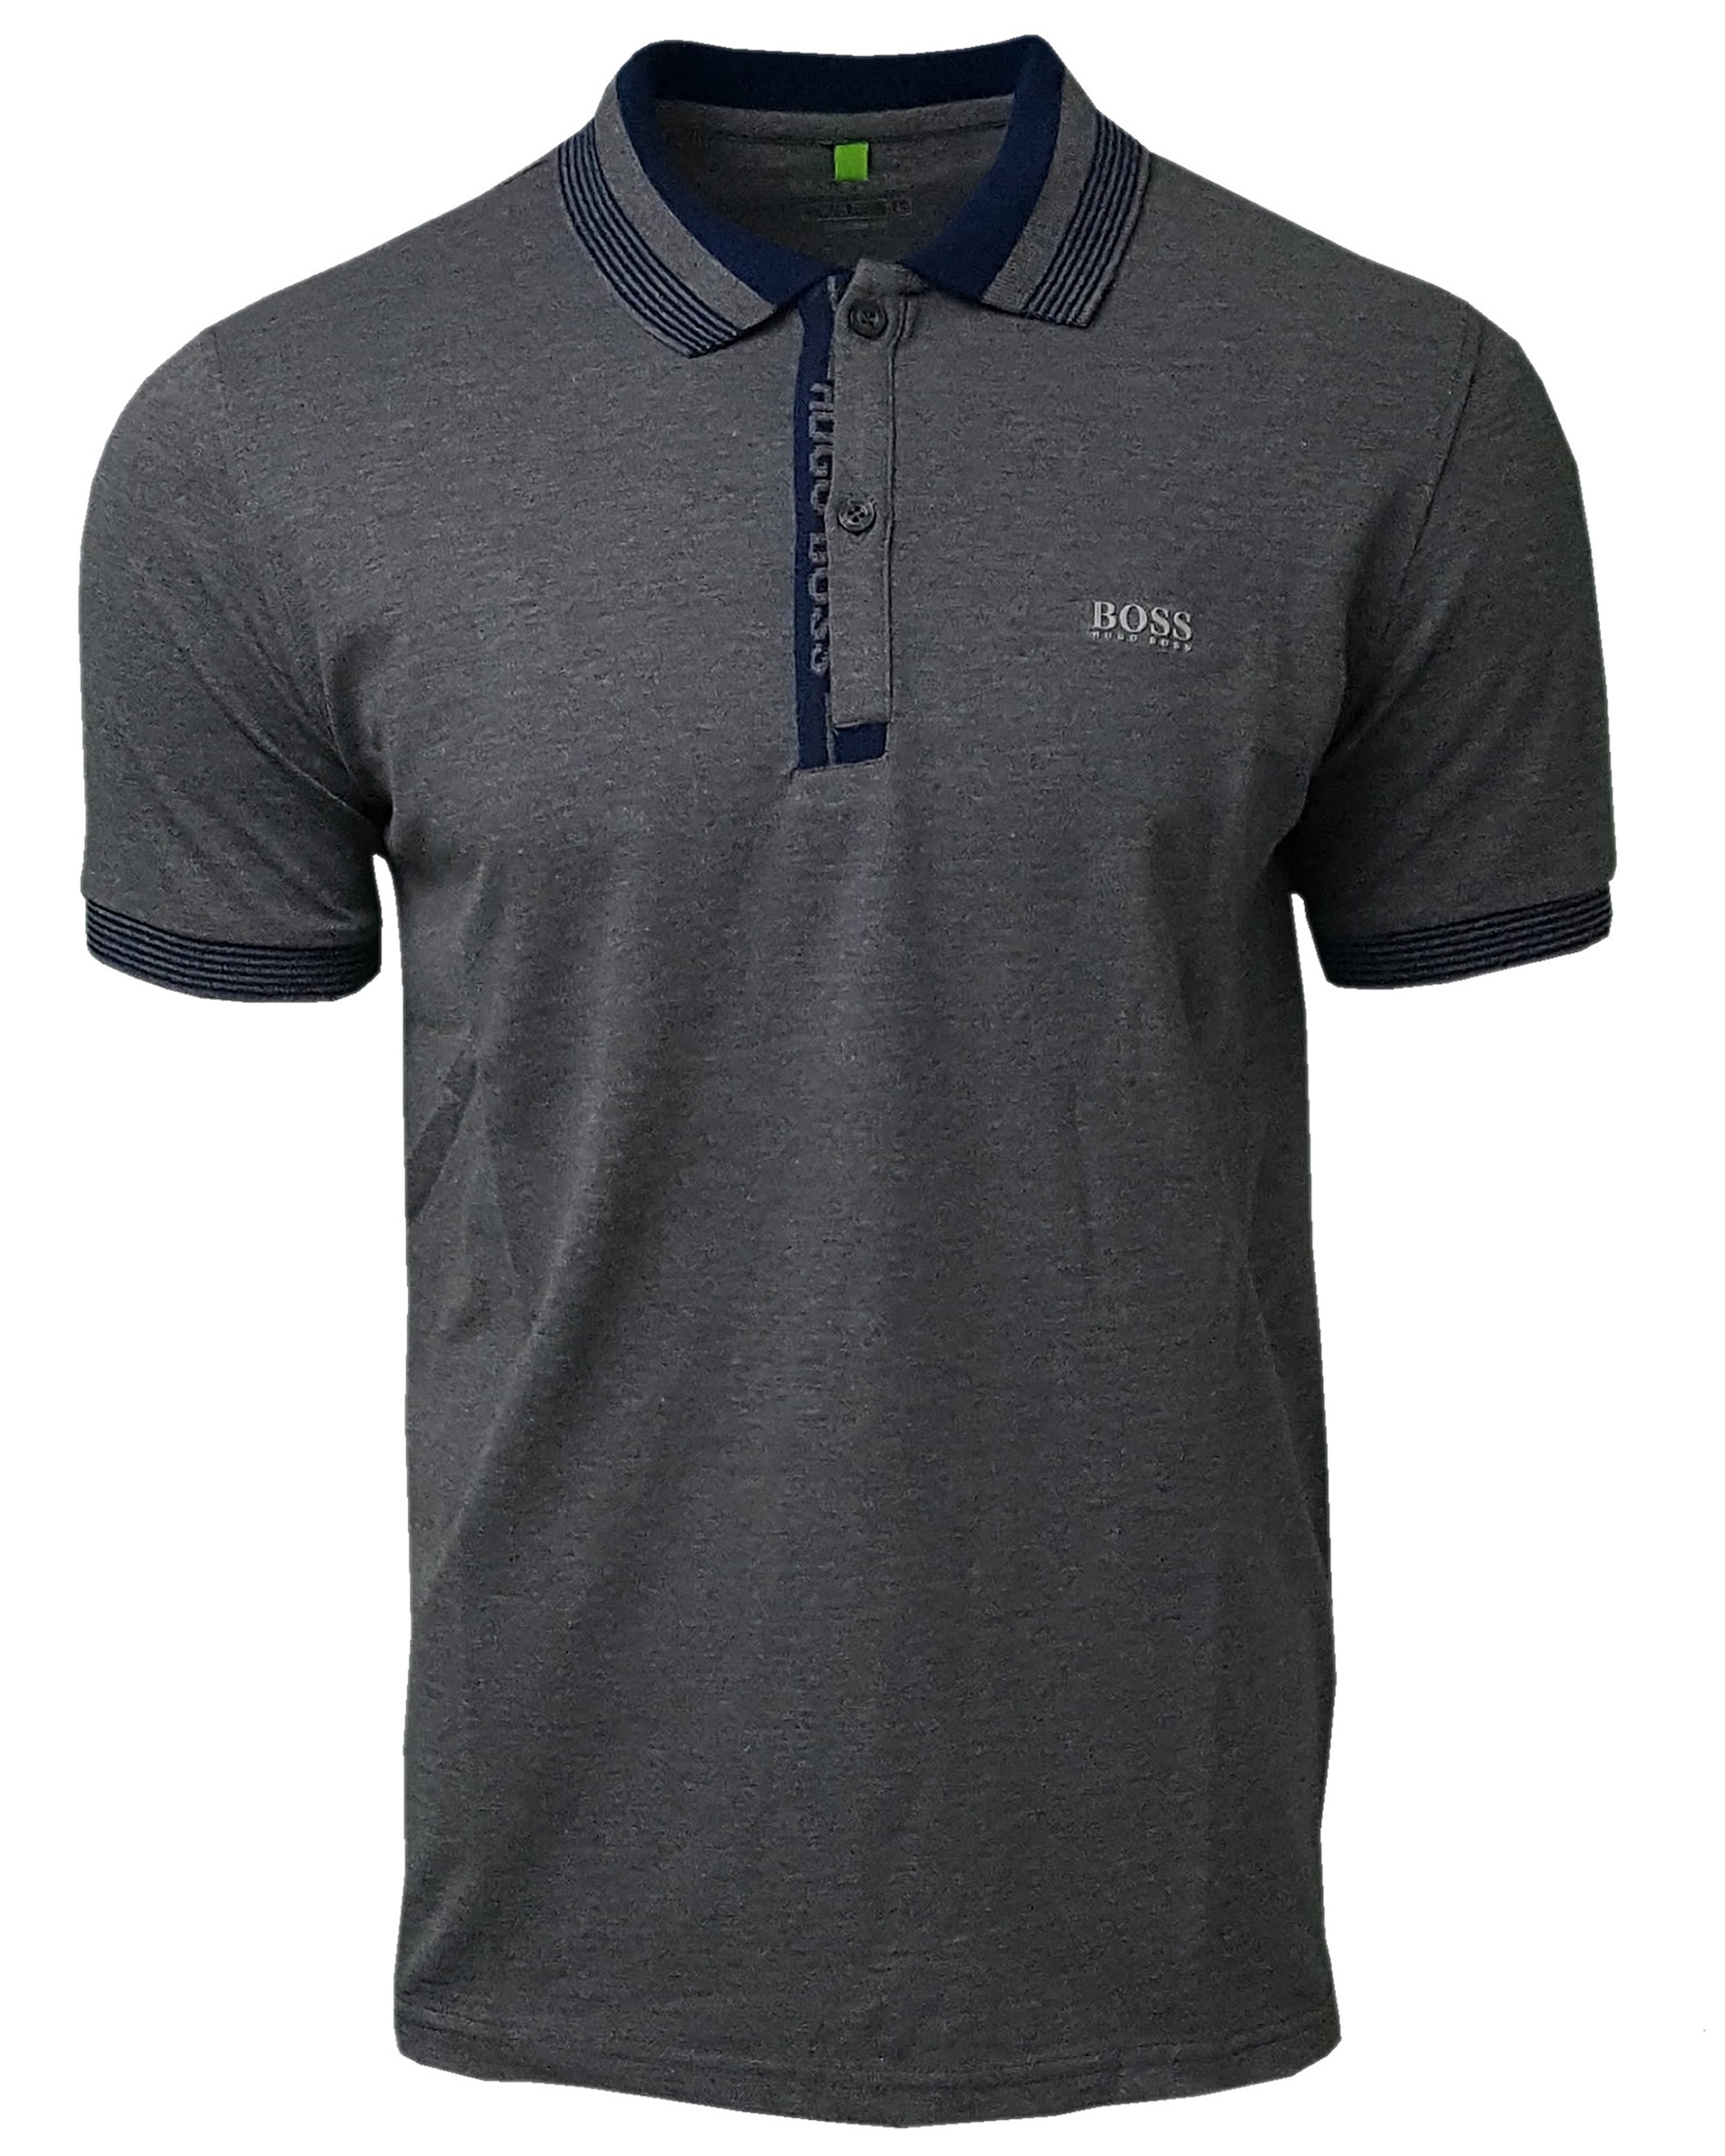 368da6e6058 Hugo Boss Paule Polo Shirt. Short Sleeve in Grey